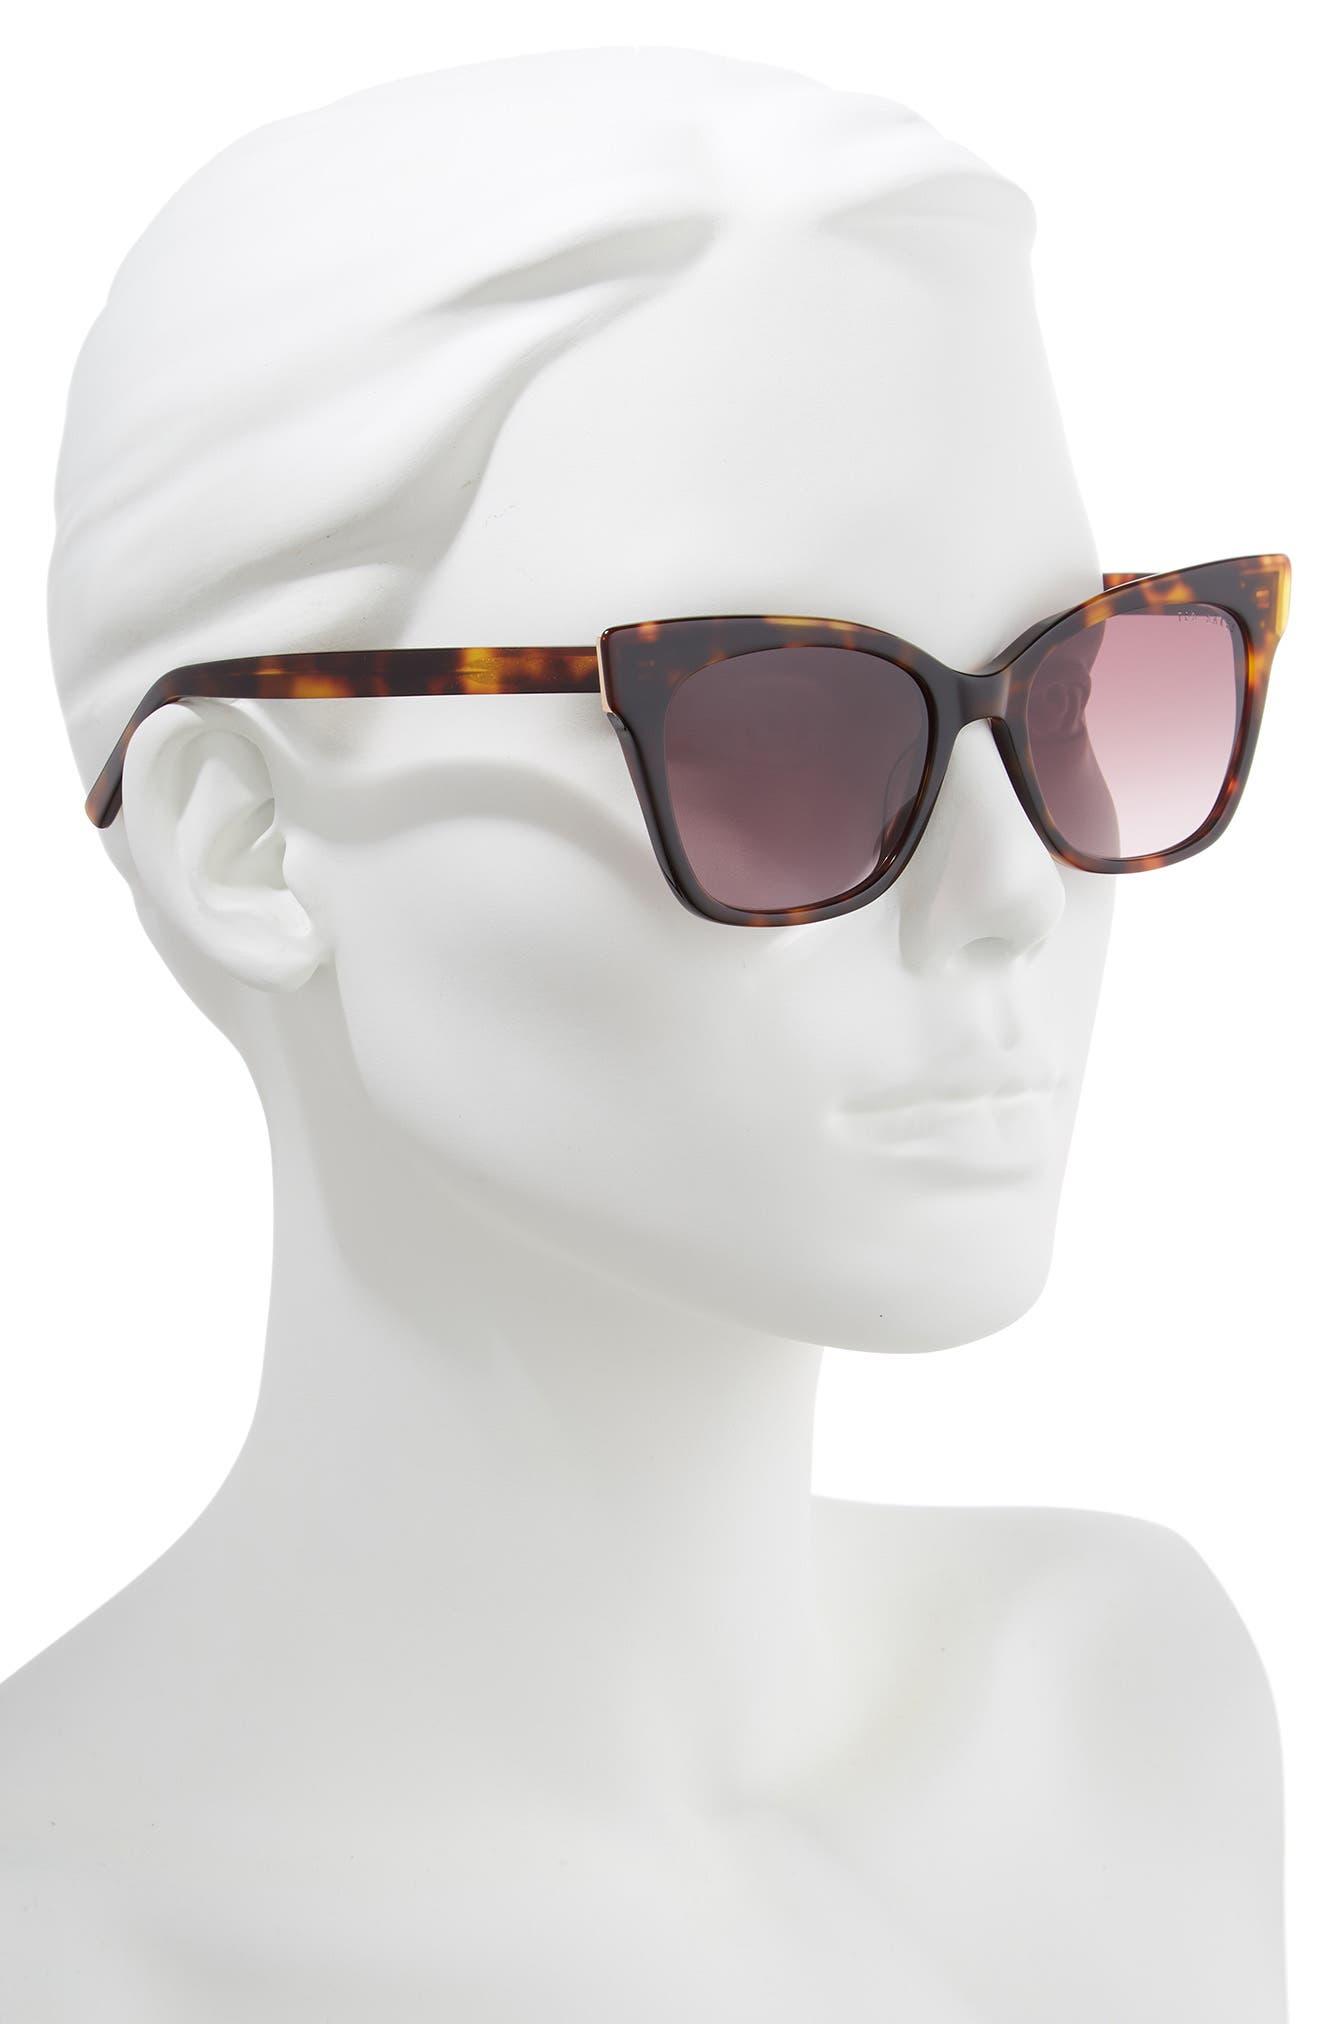 53mm Square Cat Eye Sunglasses,                             Alternate thumbnail 2, color,                             TORTOISE